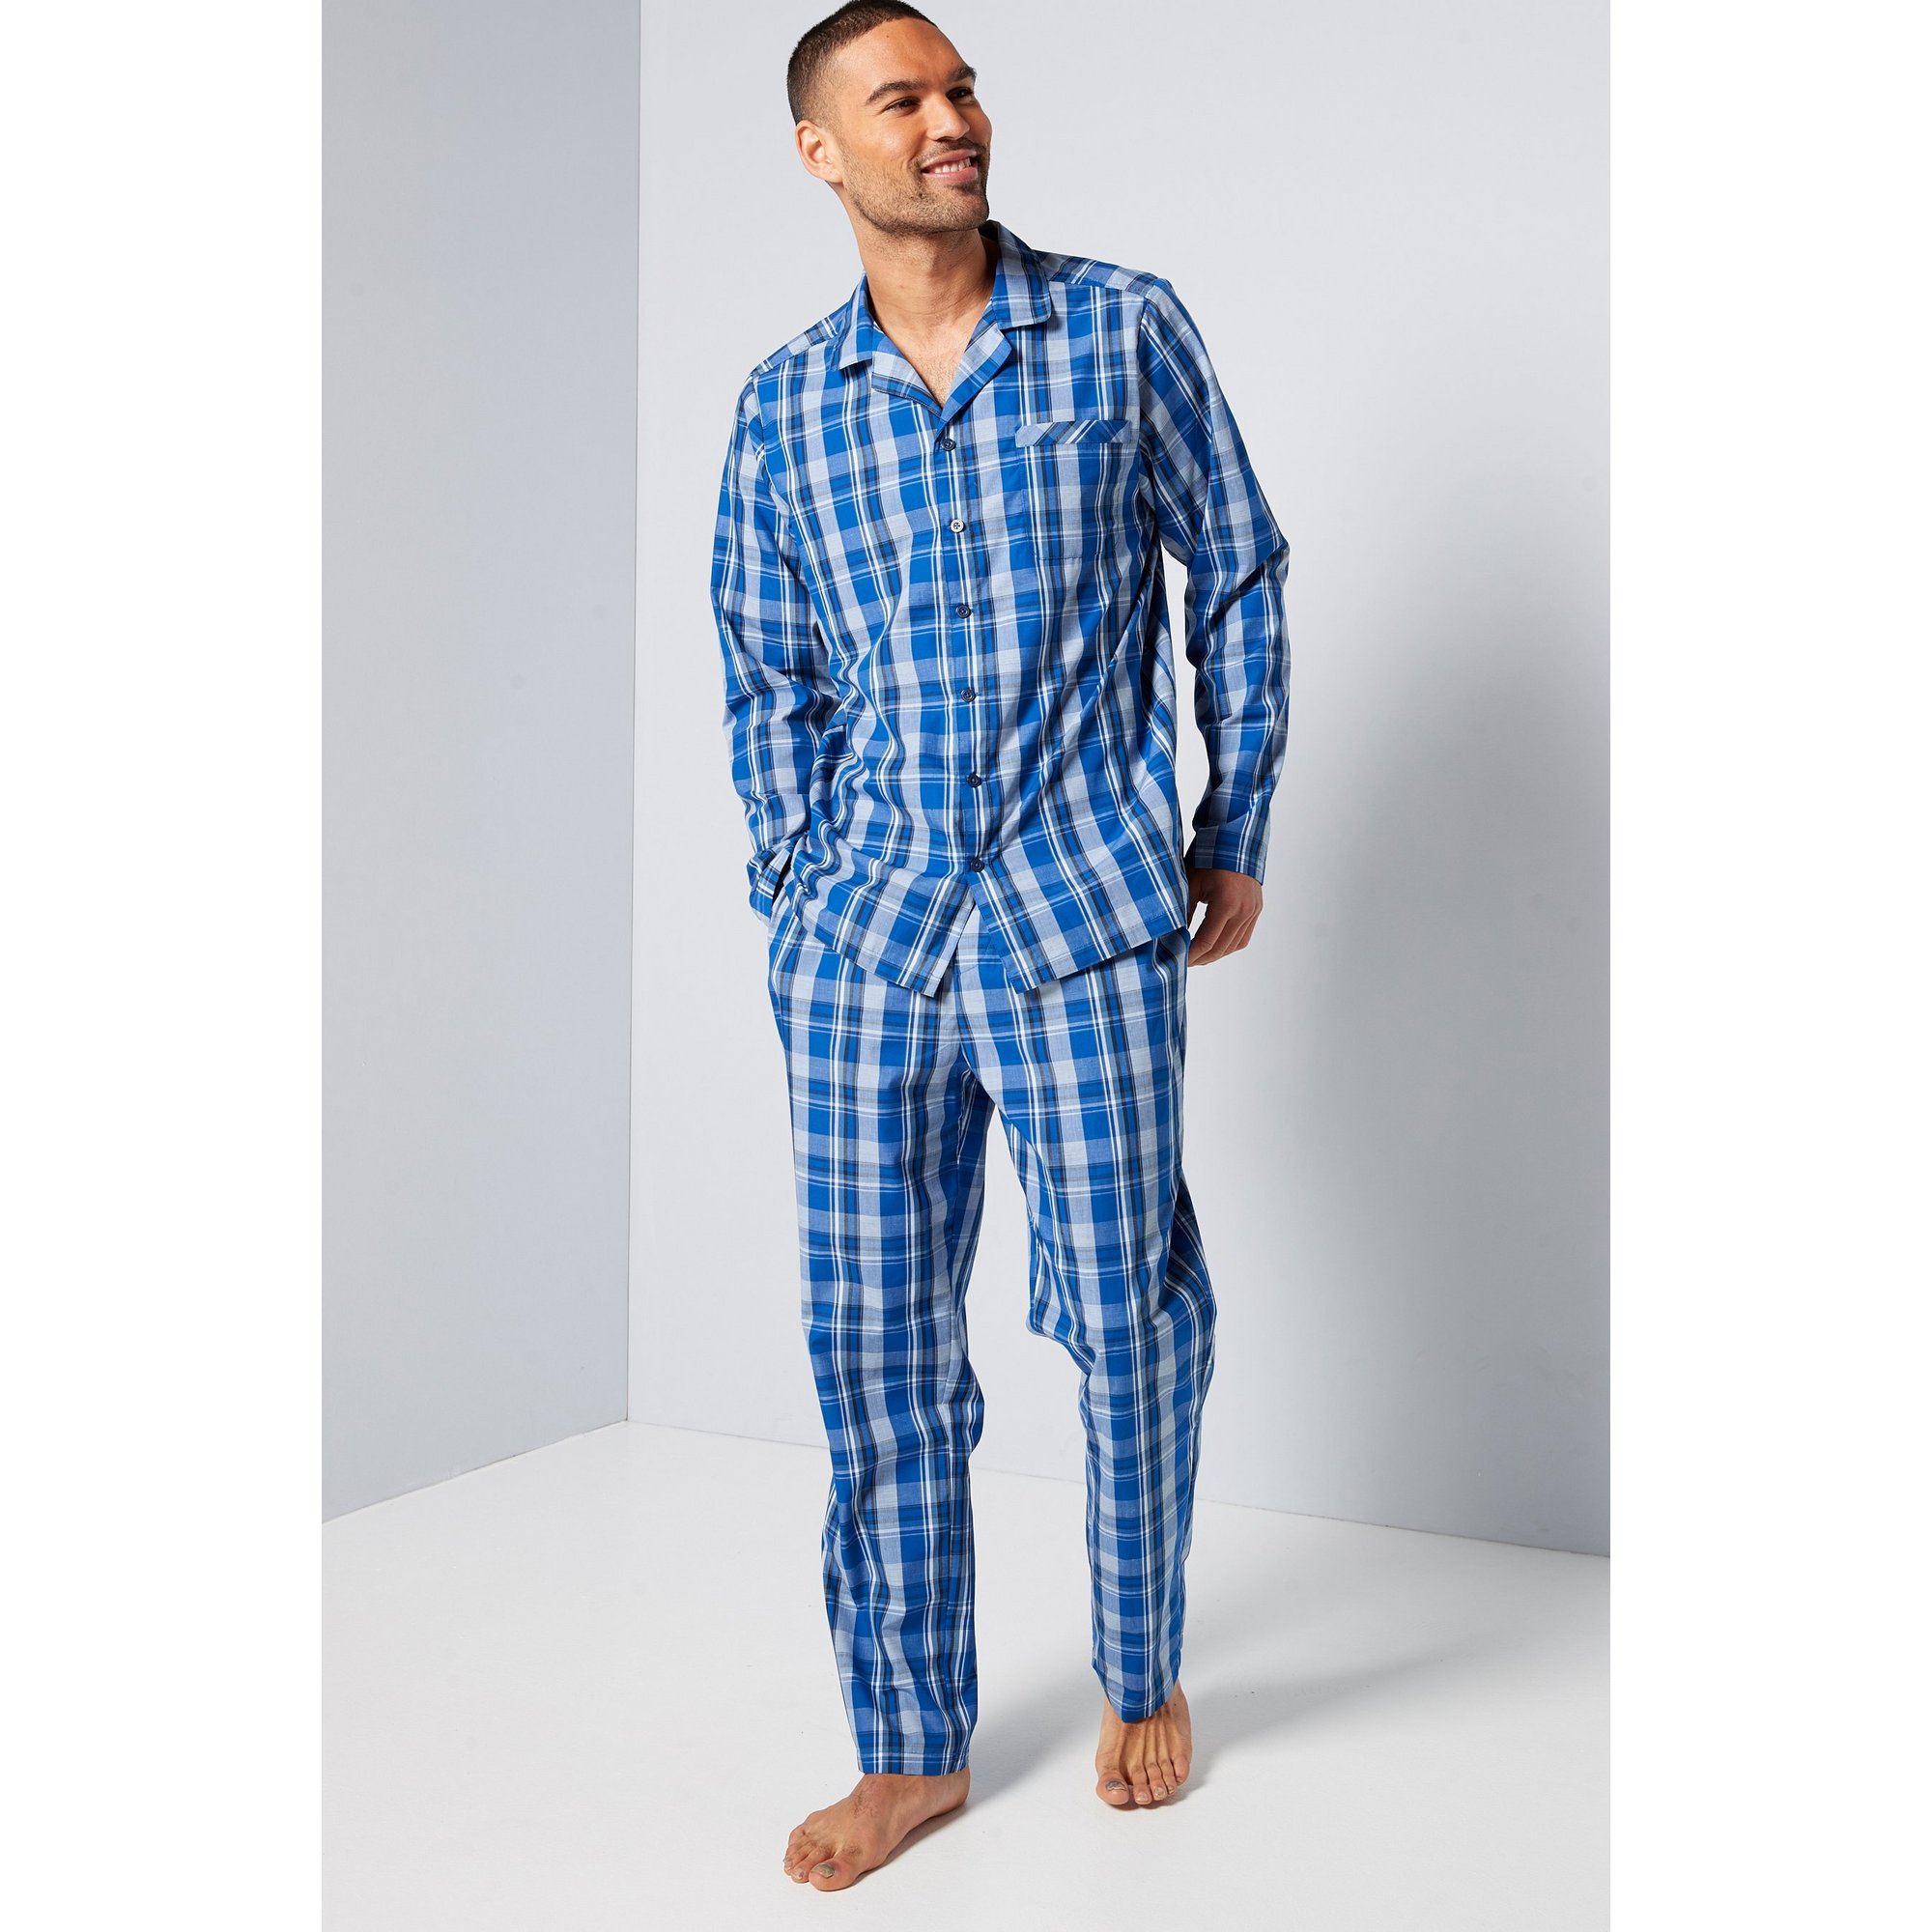 Image of Button Up Pyjama Set